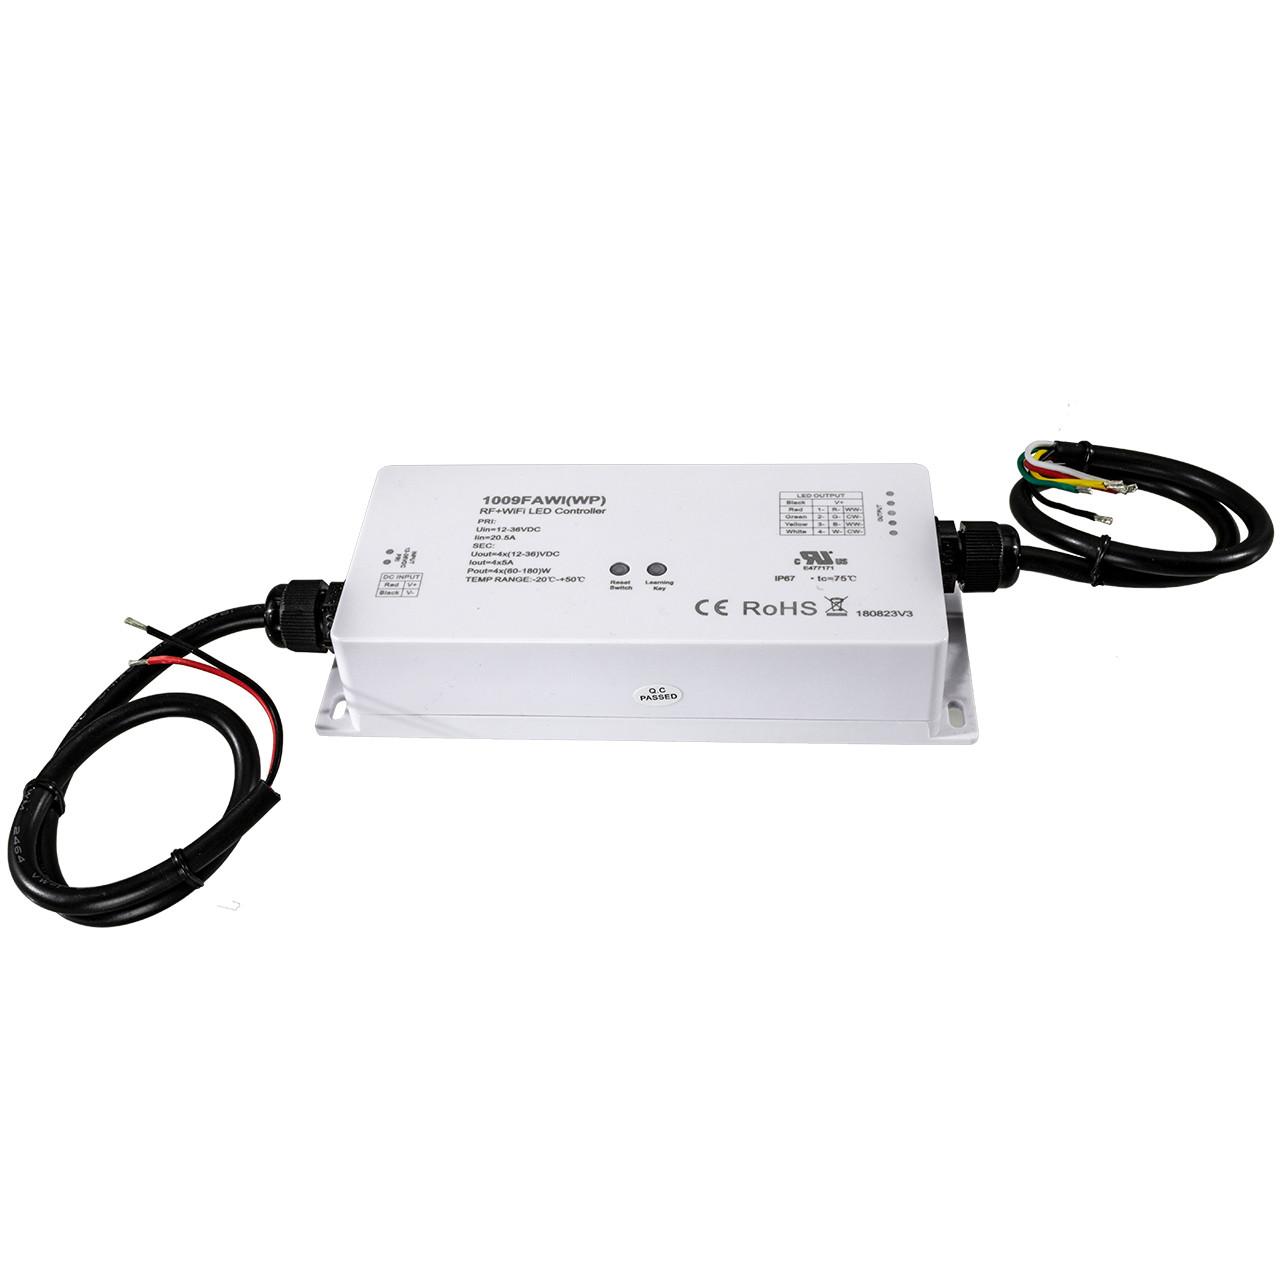 50w Rgb Led Flood Light Outdoor Spotlights Cord Plug Wire Remote